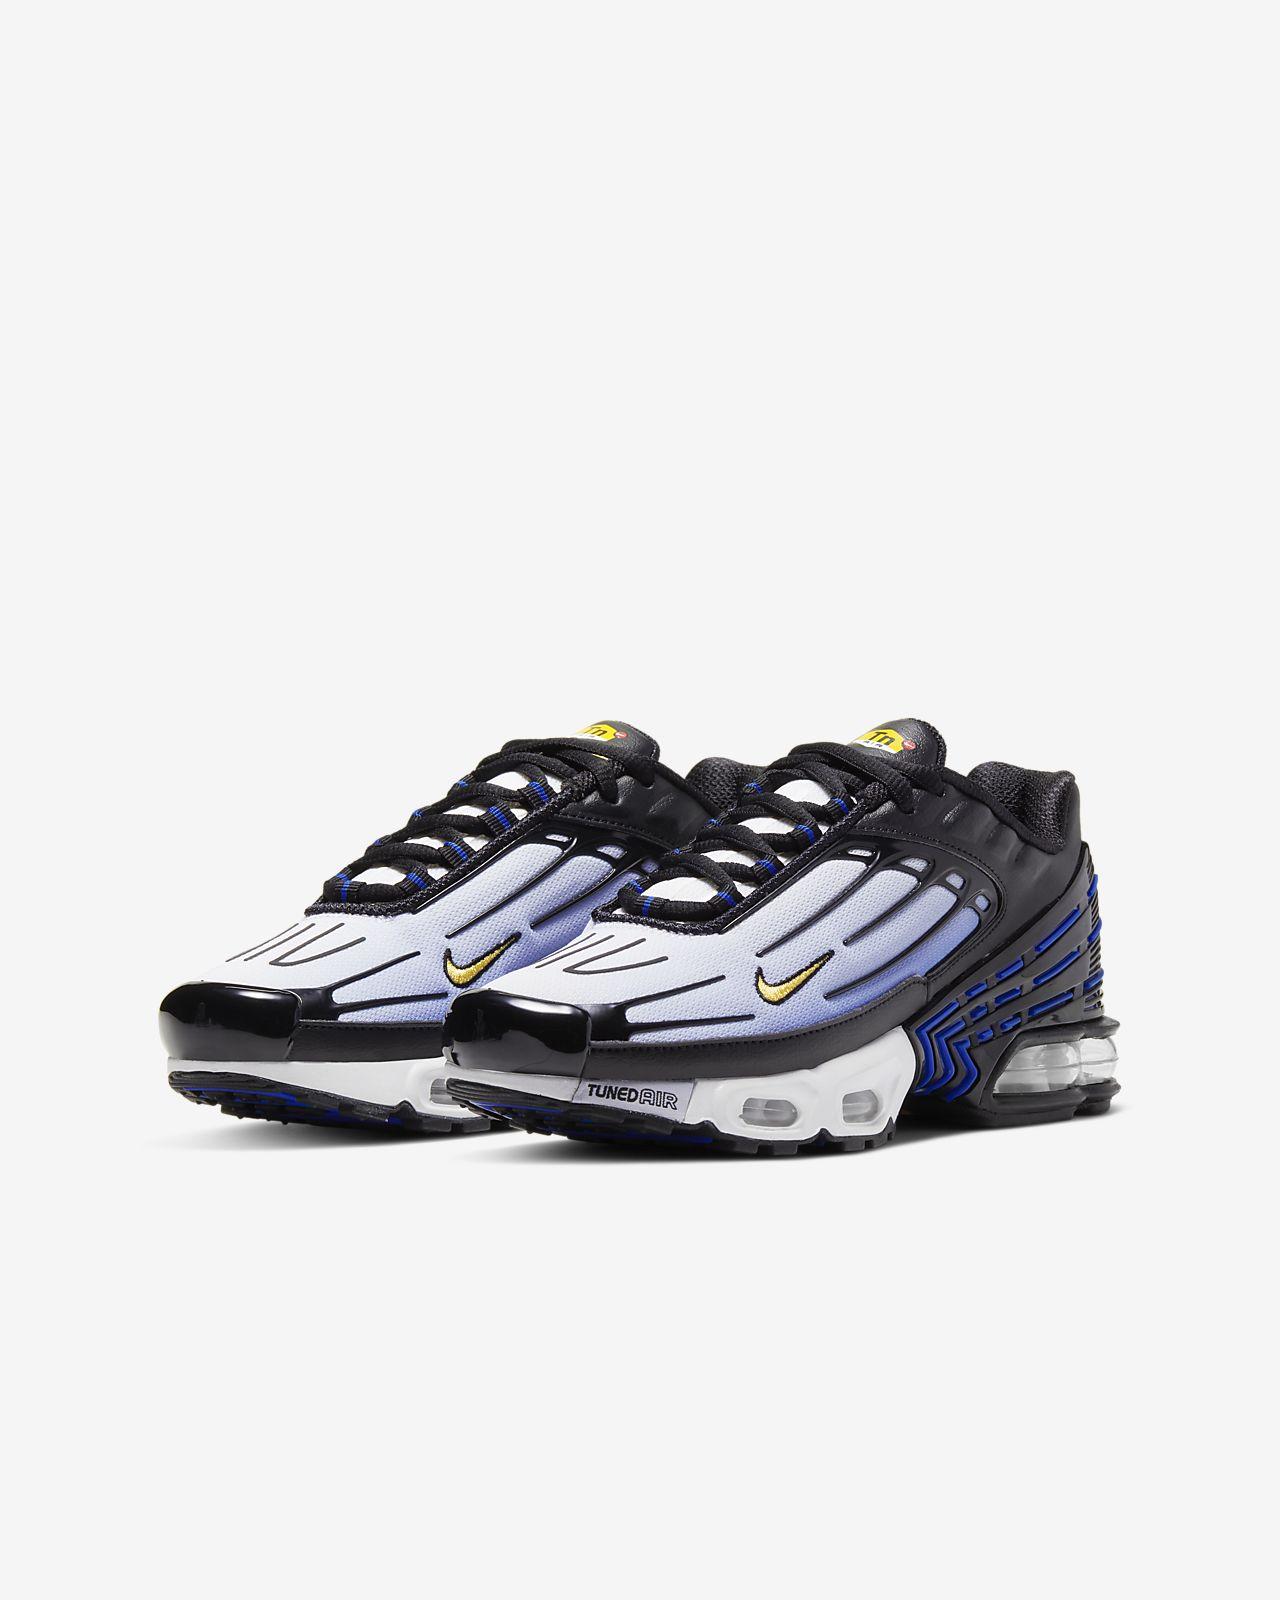 Nike Mercurial TN Air Max Plus Yellow Black White Sneakers